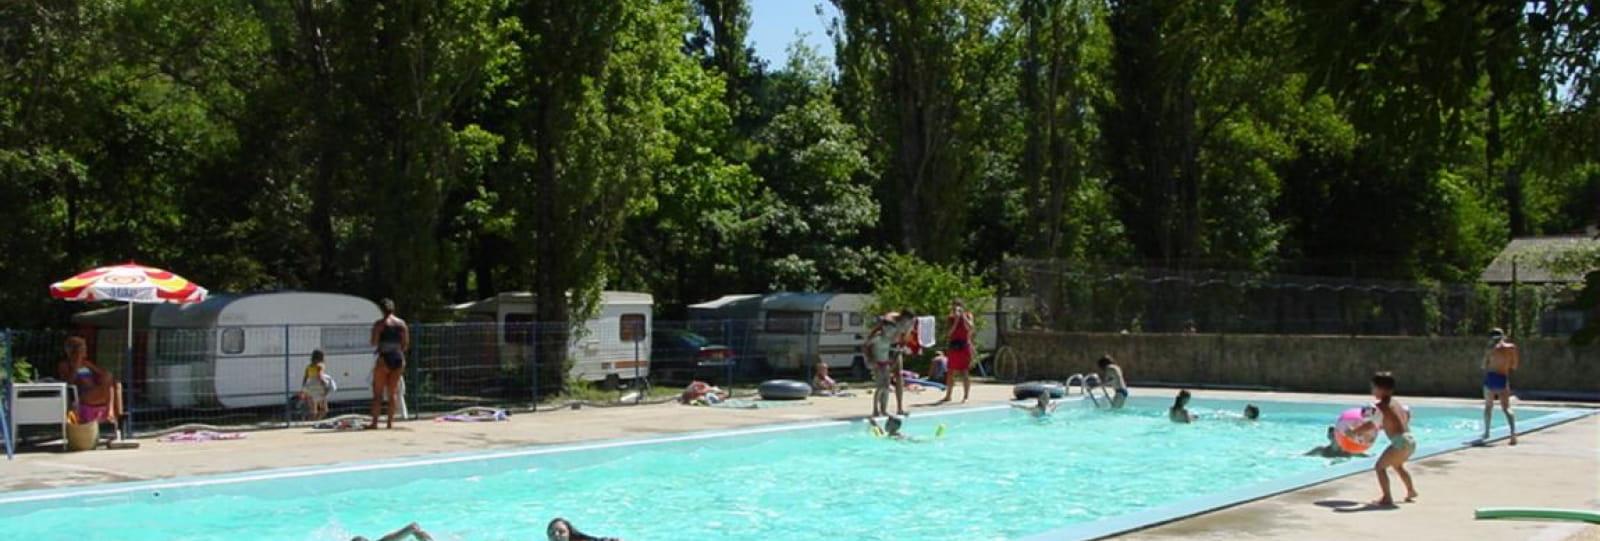 Camping la Piboure